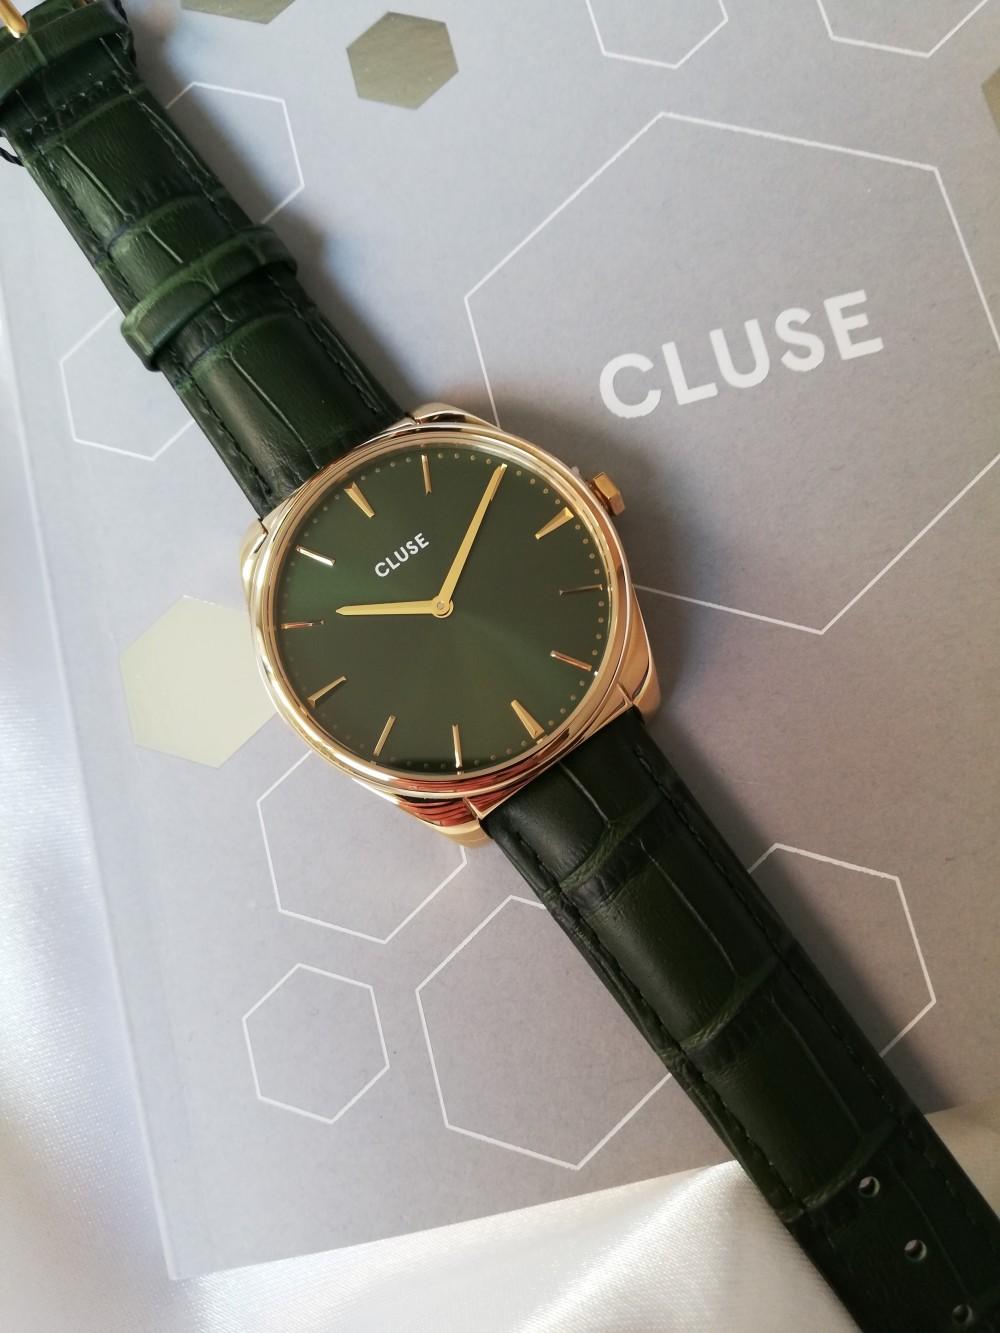 Orologio cinturino pelle cocco verde Cluse